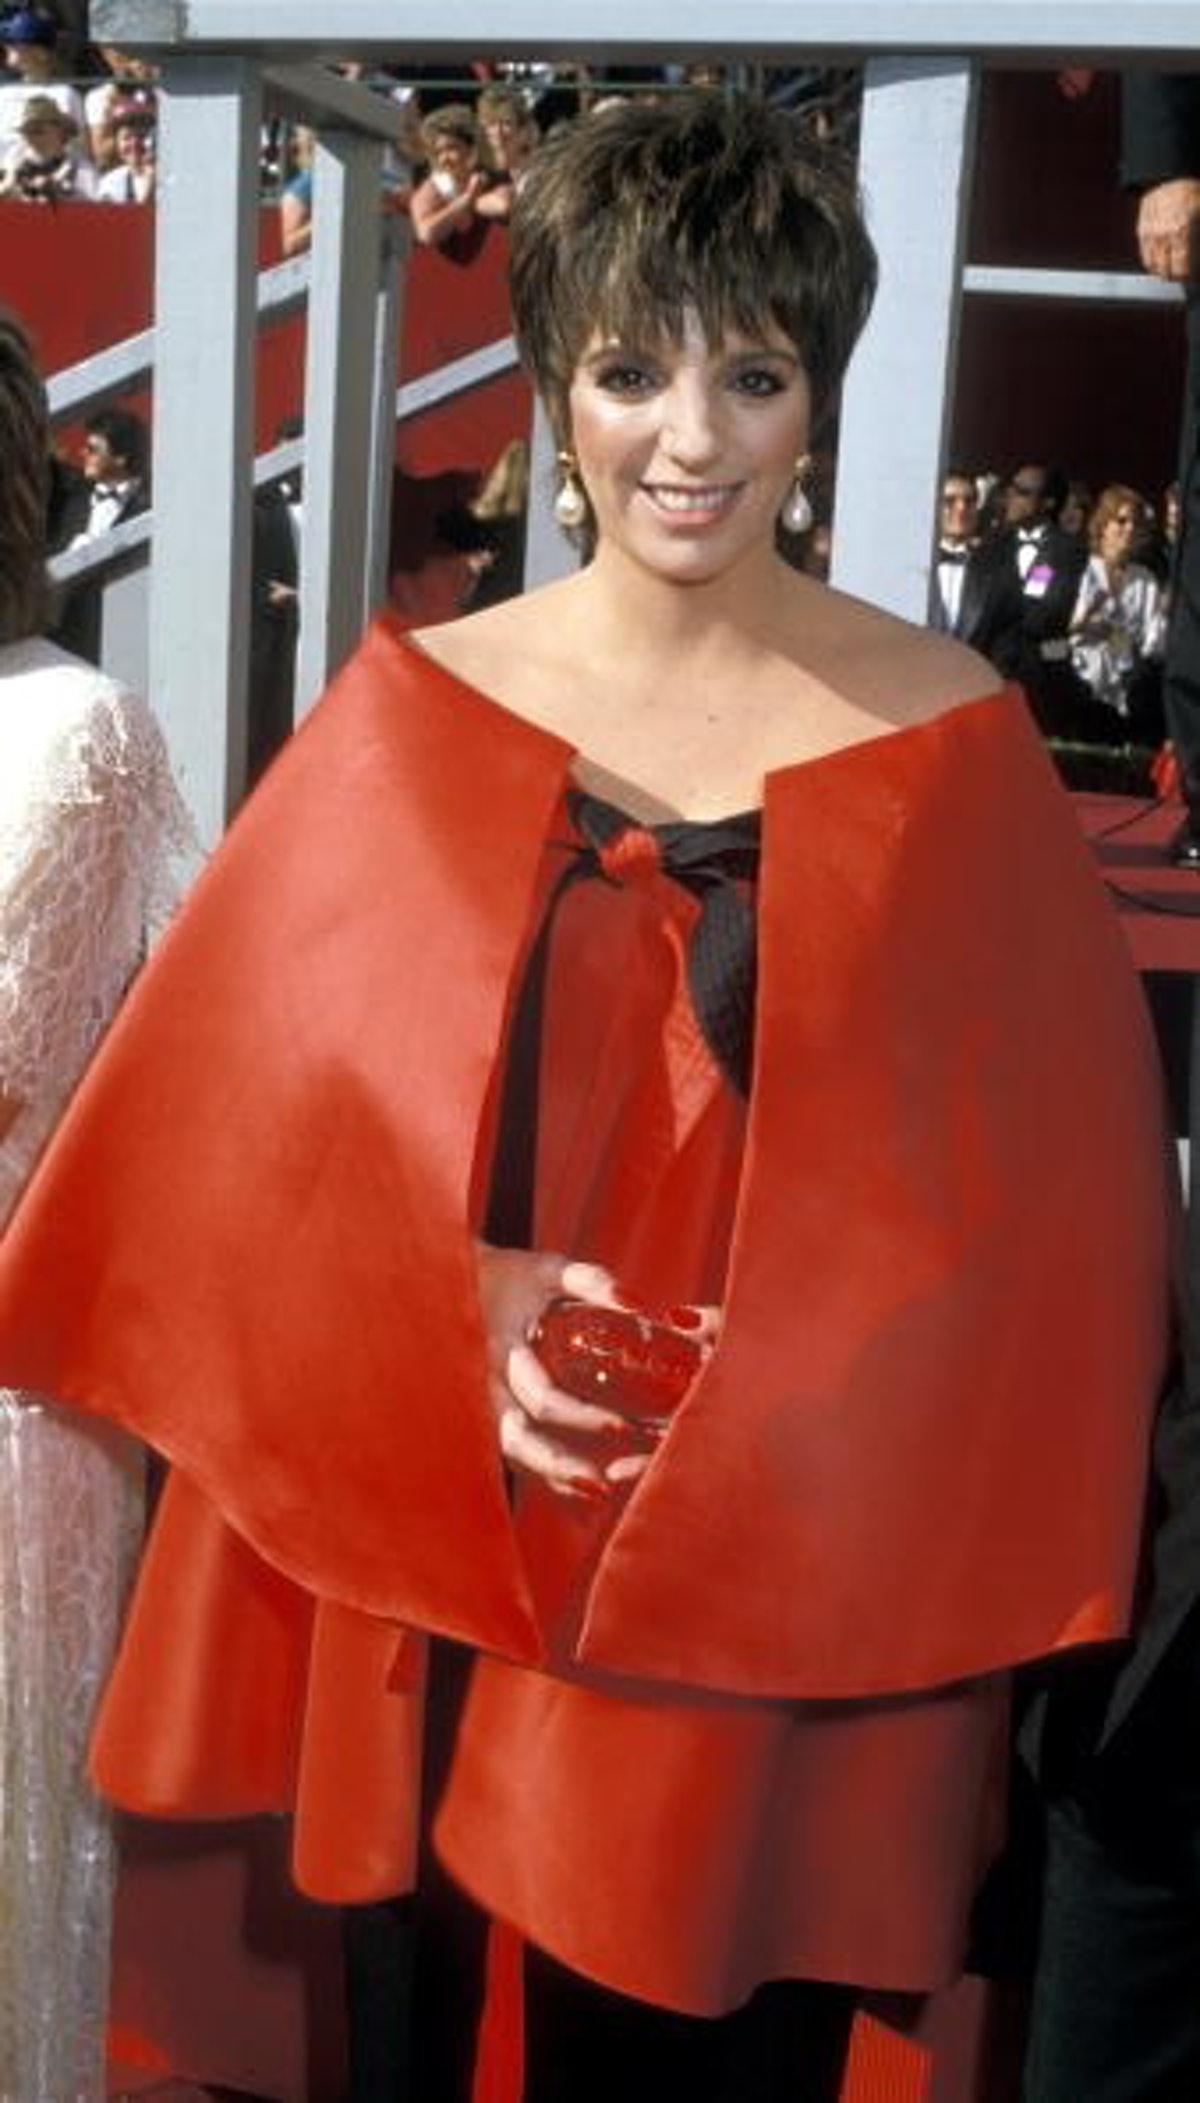 Liza wears a red gown